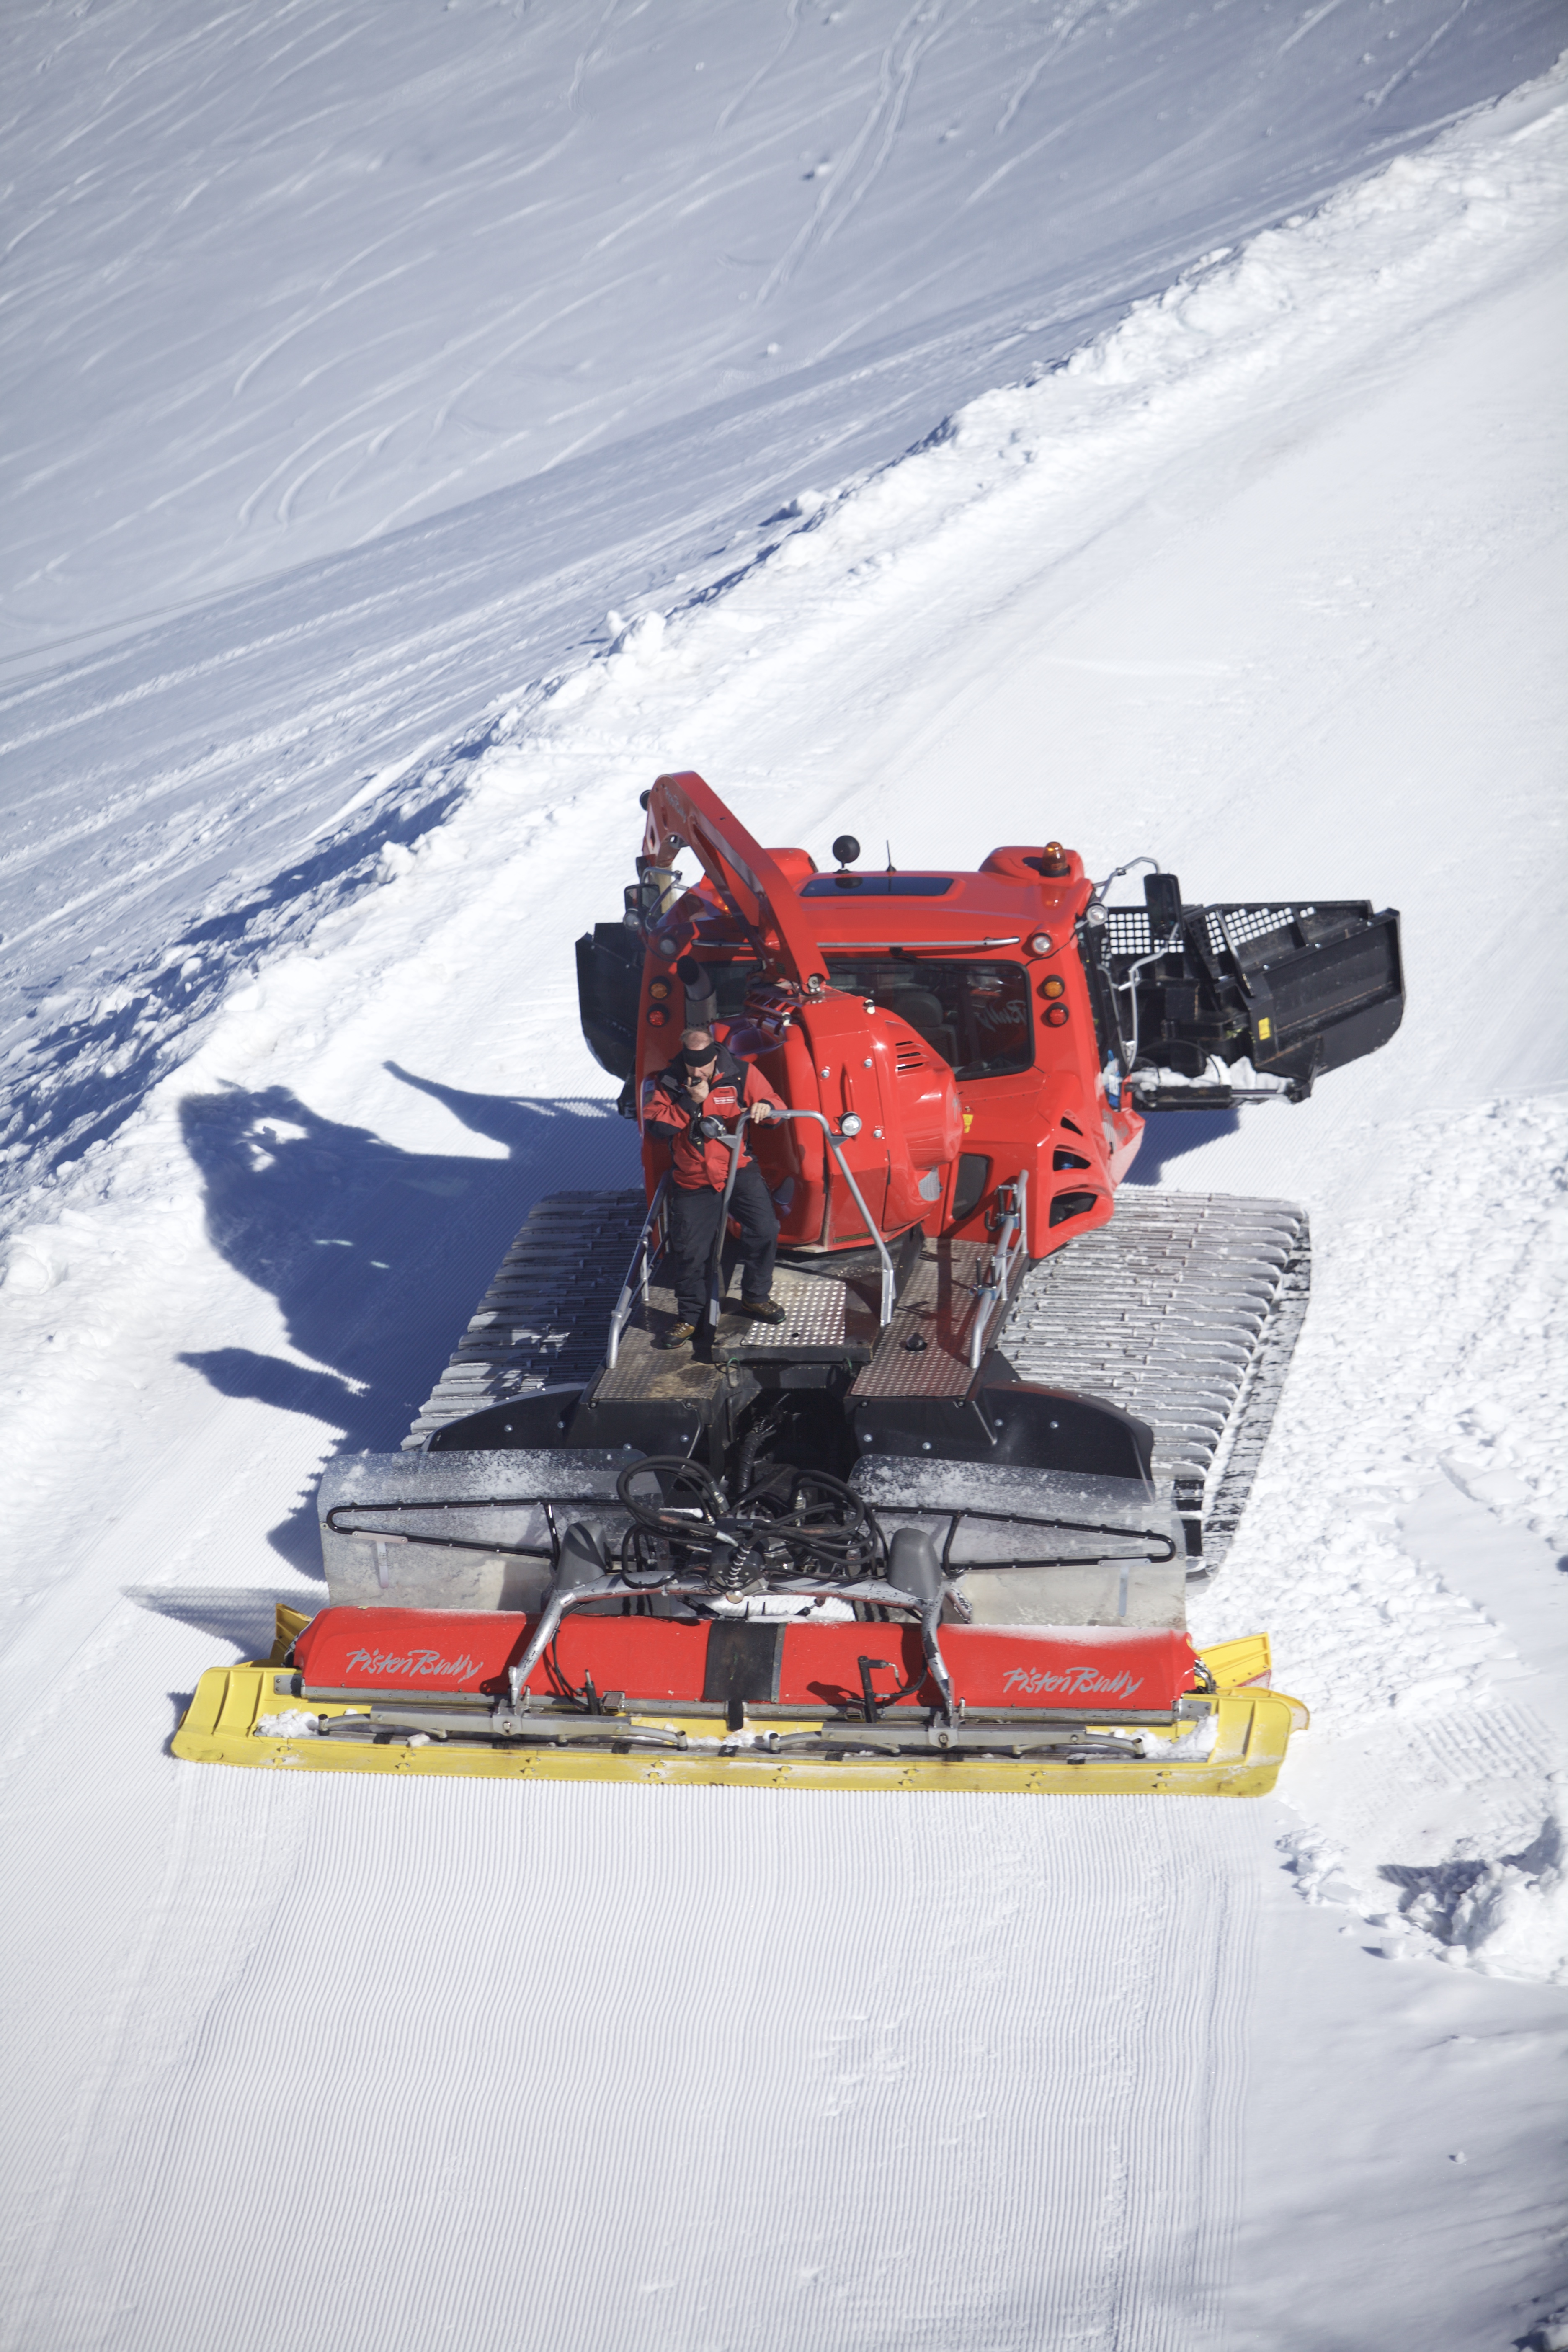 Snow conditioner